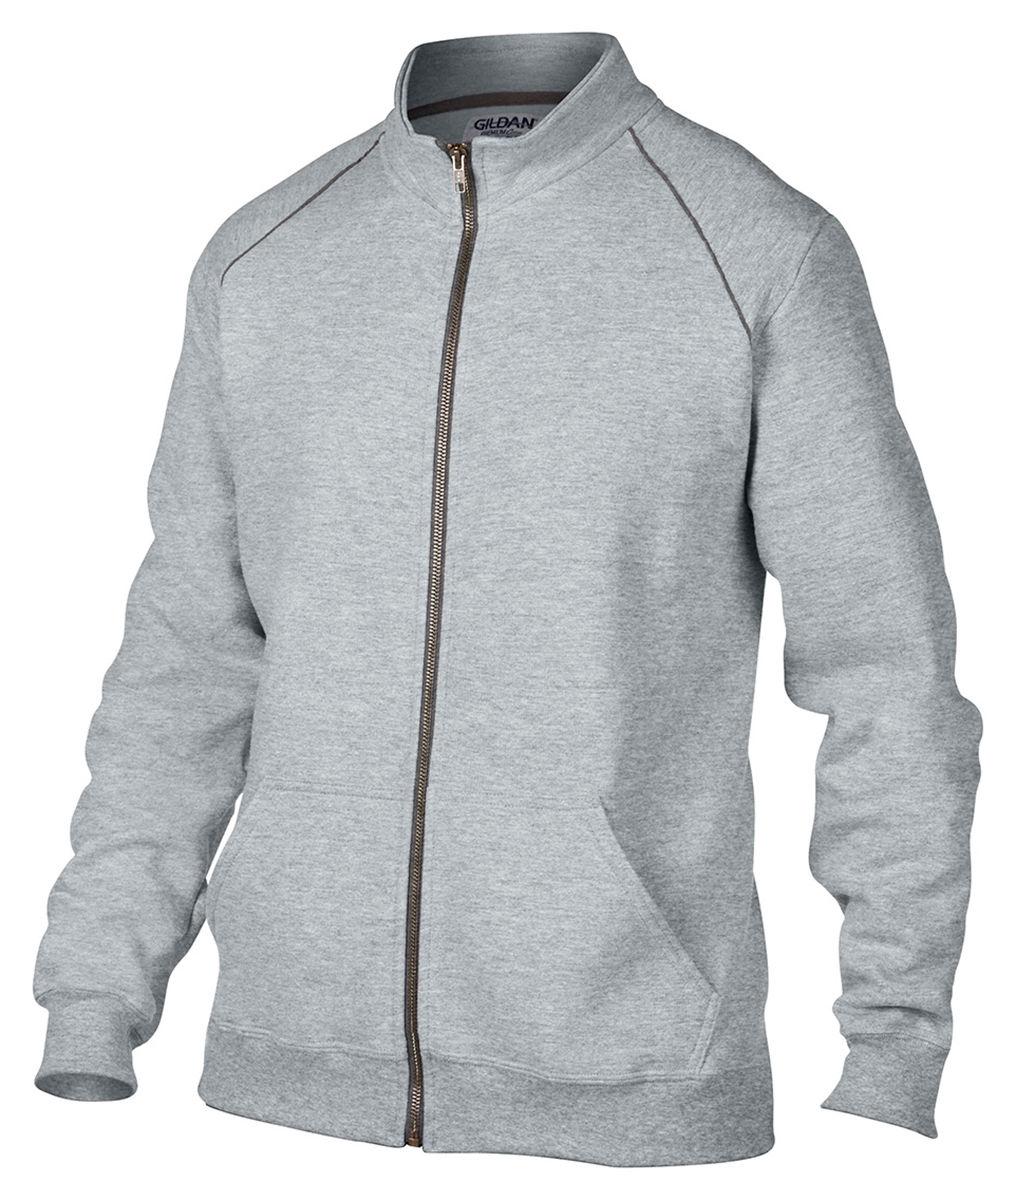 Gildan-Men-039-s-Rolled-Forward-Shoulders-Full-Zip-Pouch-Pocket-Fleece-Jacket-92900 thumbnail 8